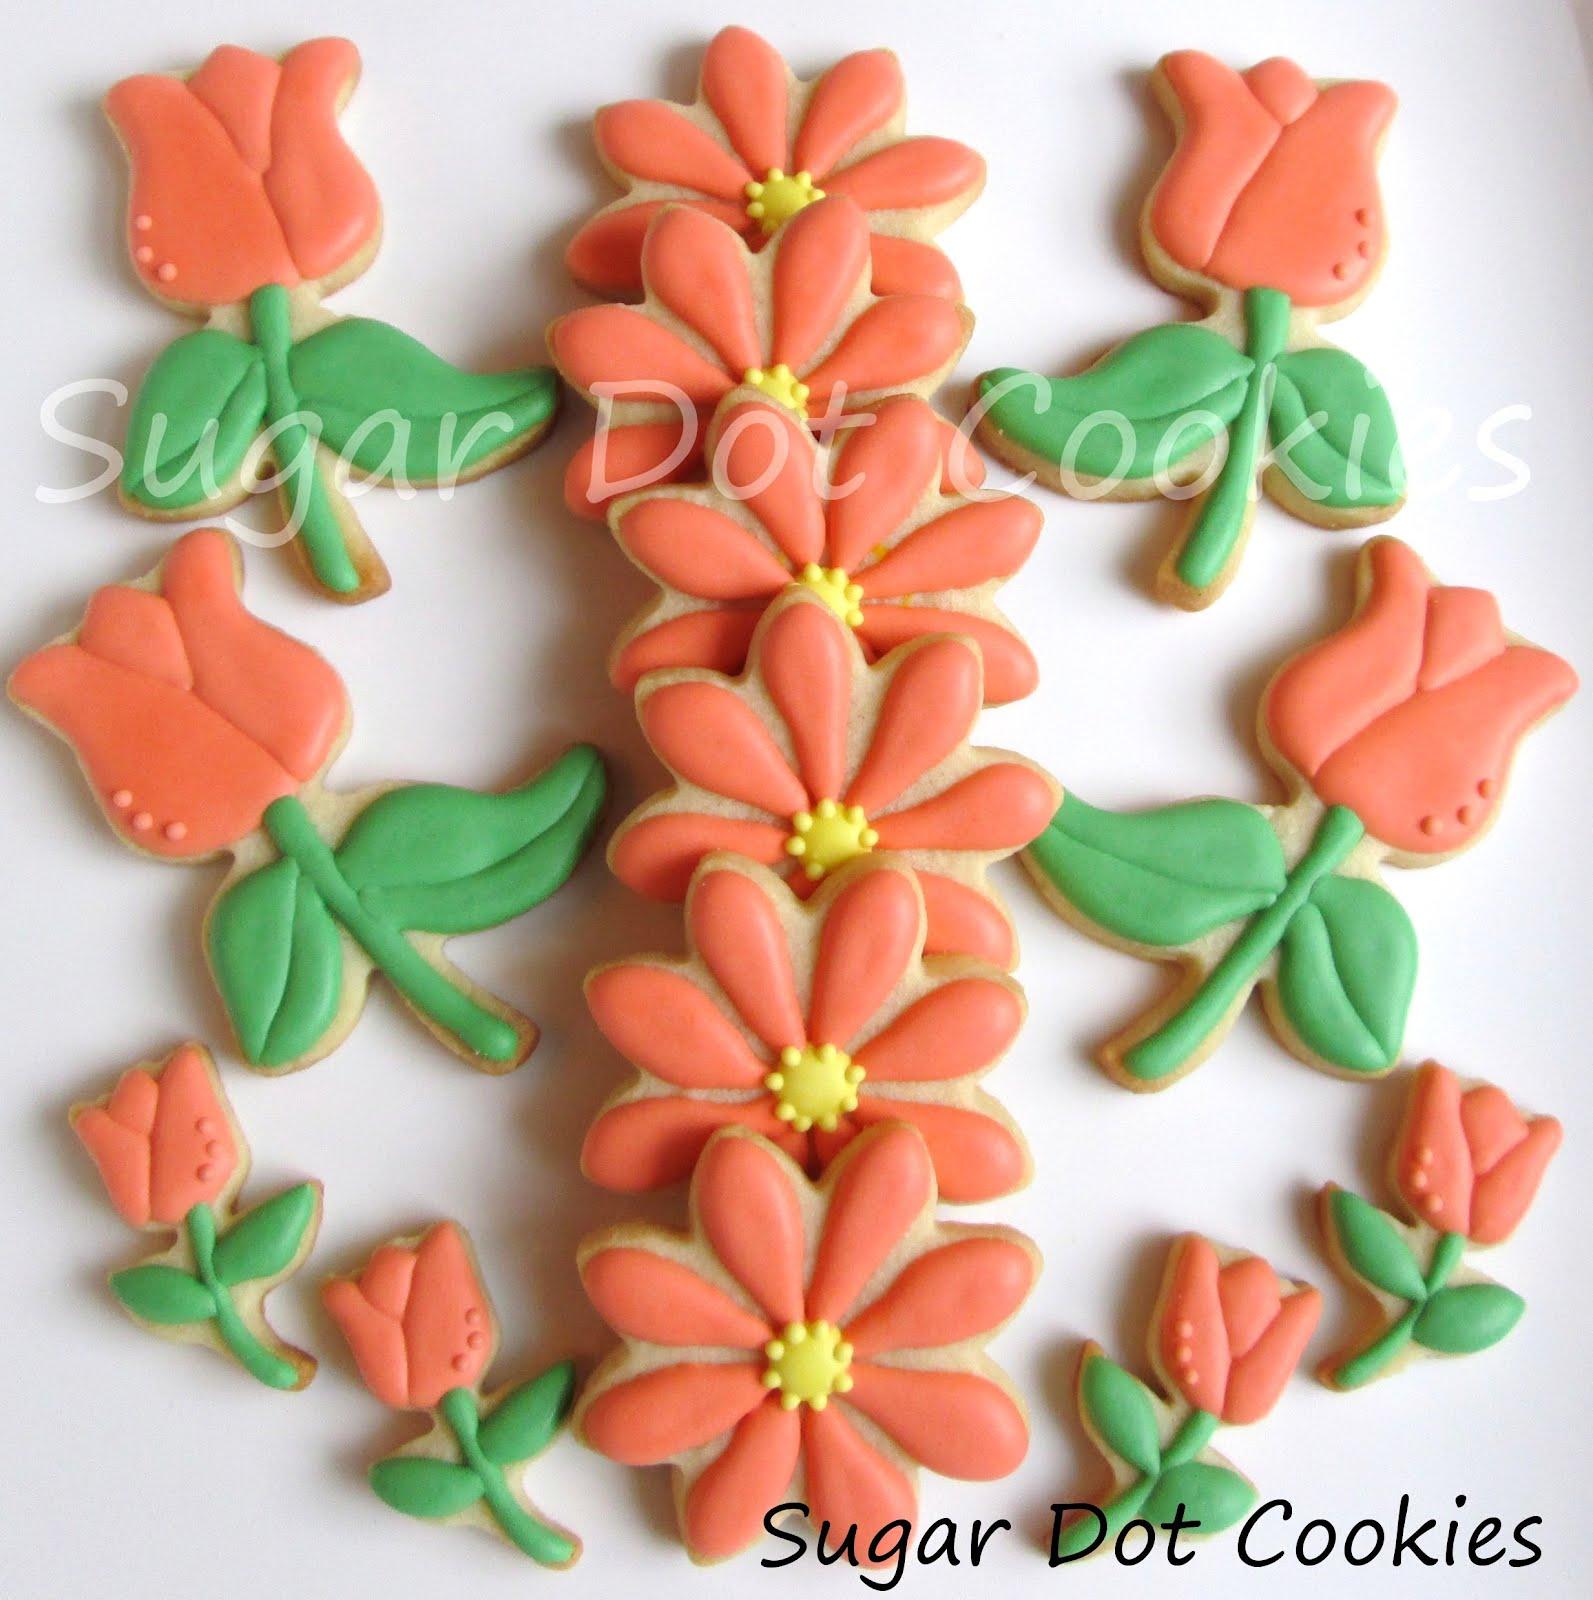 Aren't the tulips sweet? Oh how I love mini cookies.